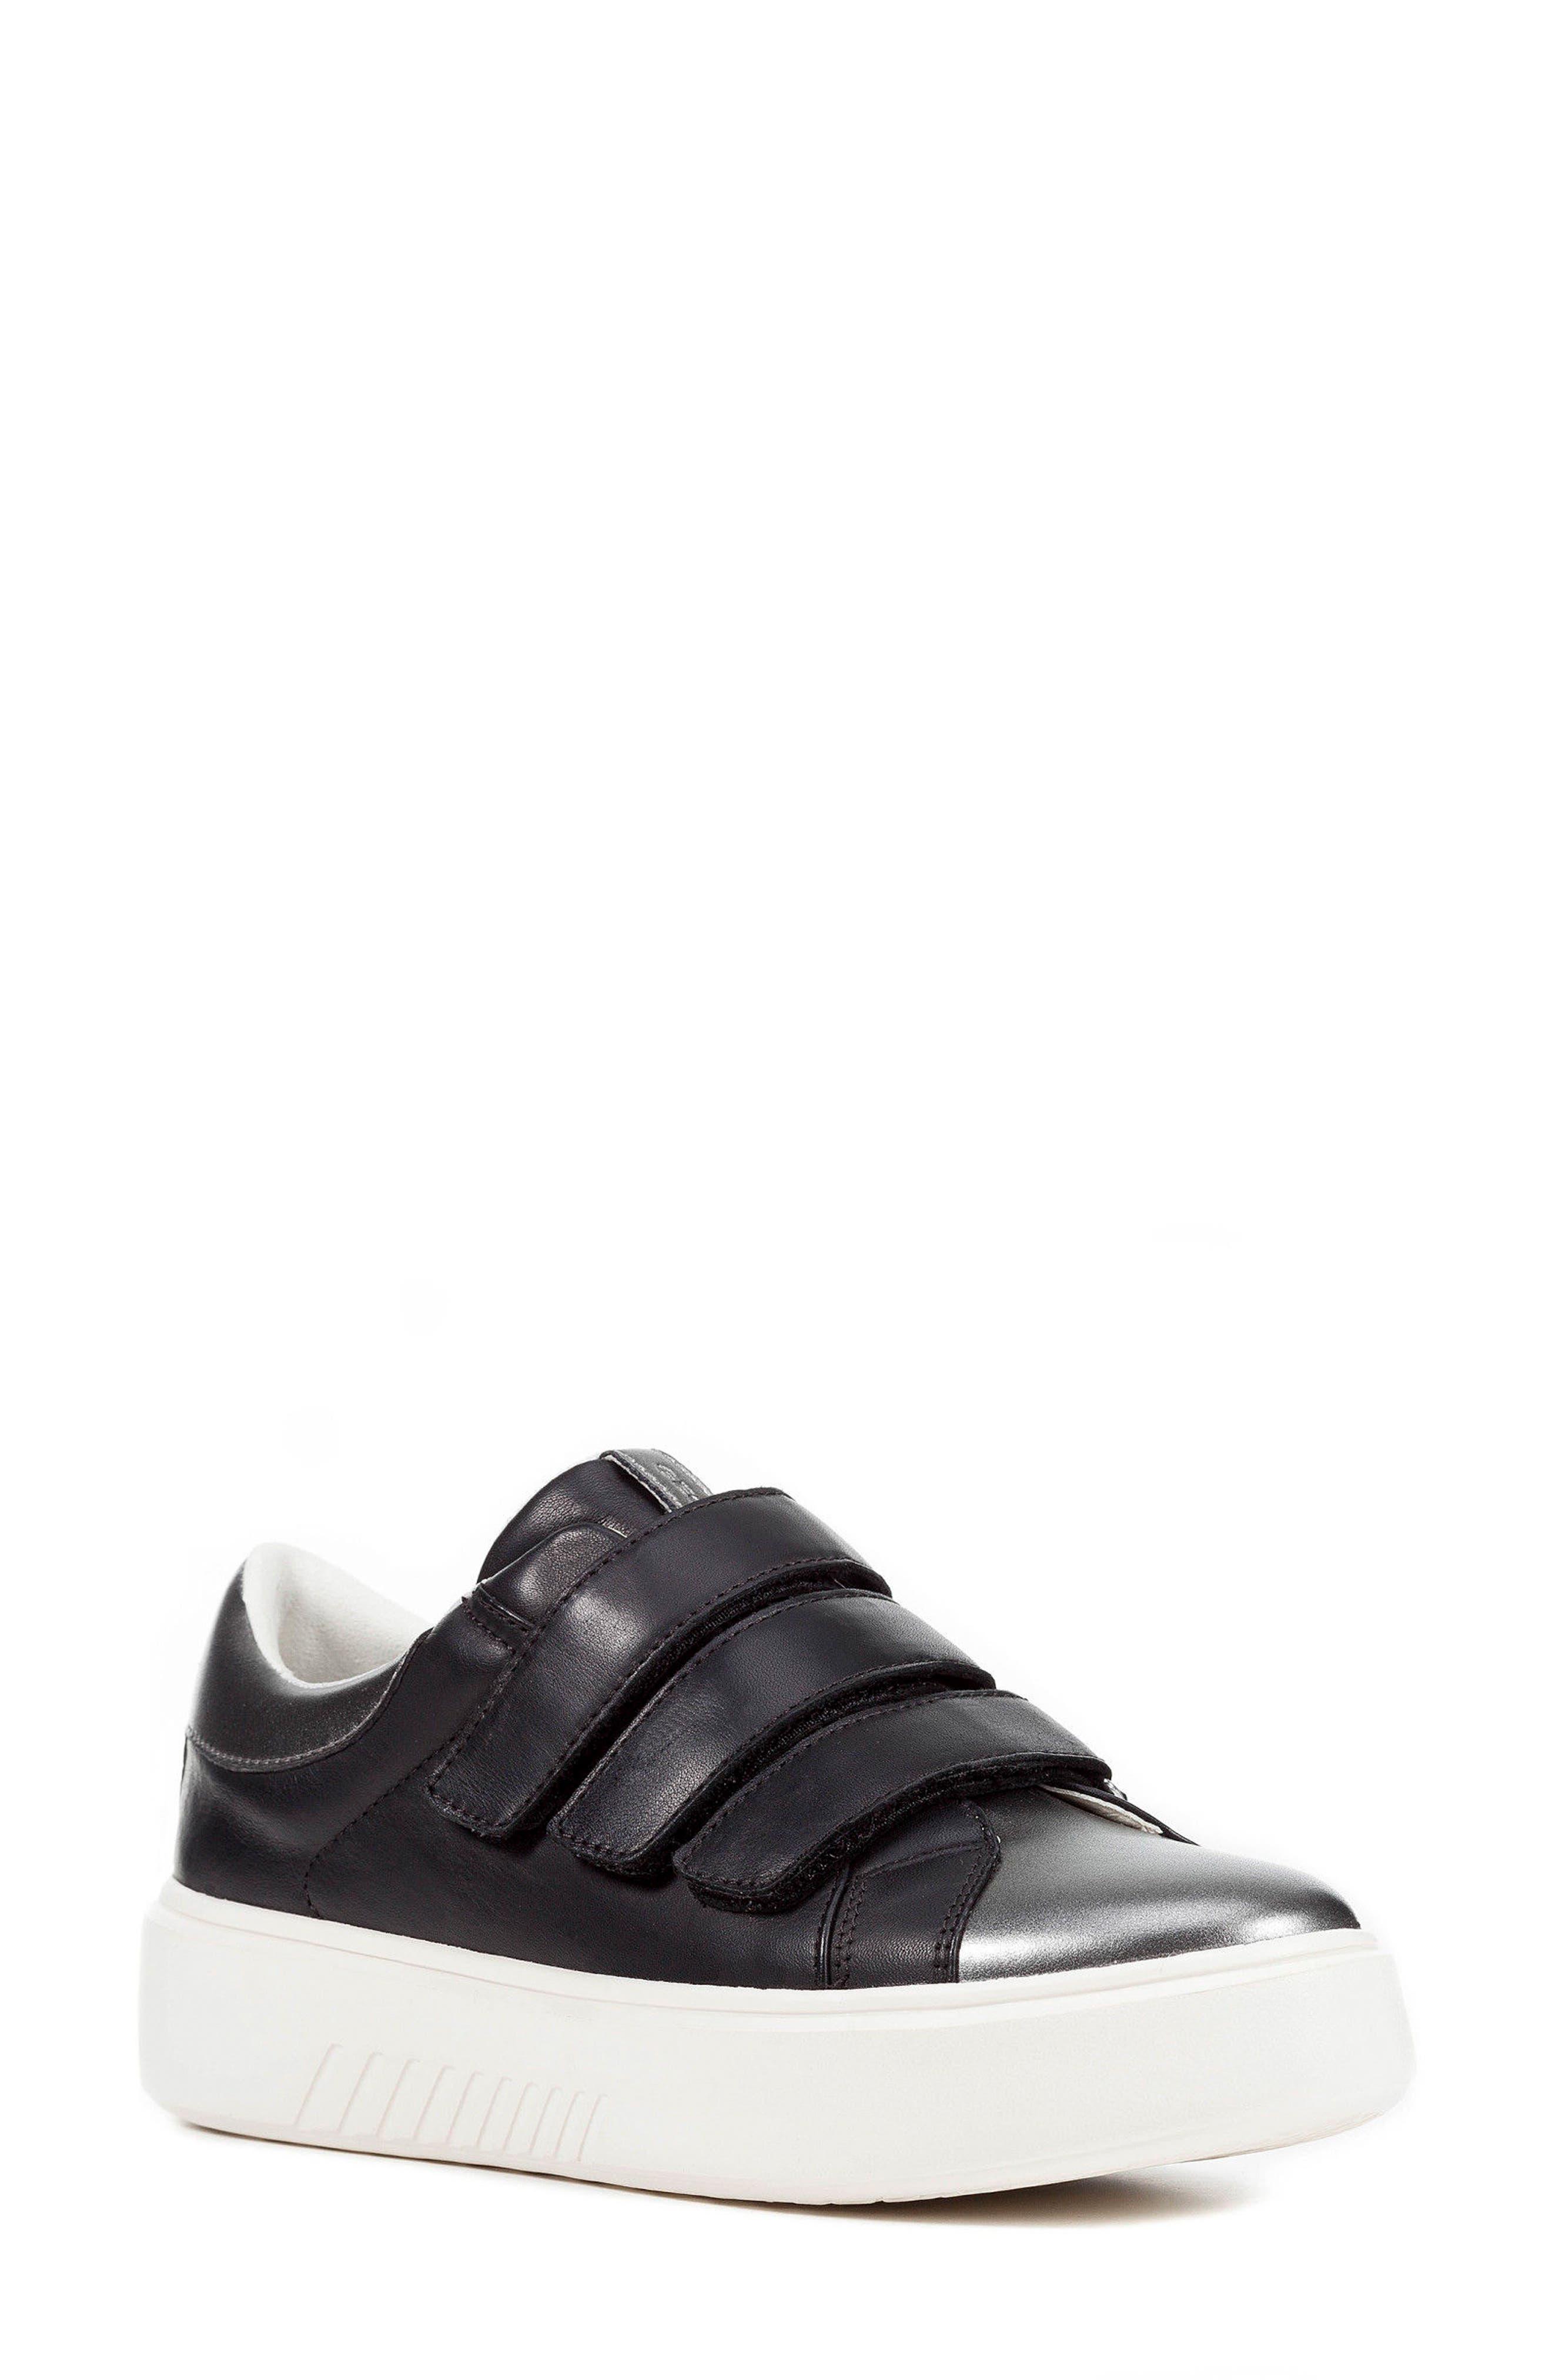 Geox Nhenbus 3 Sneaker (Women)